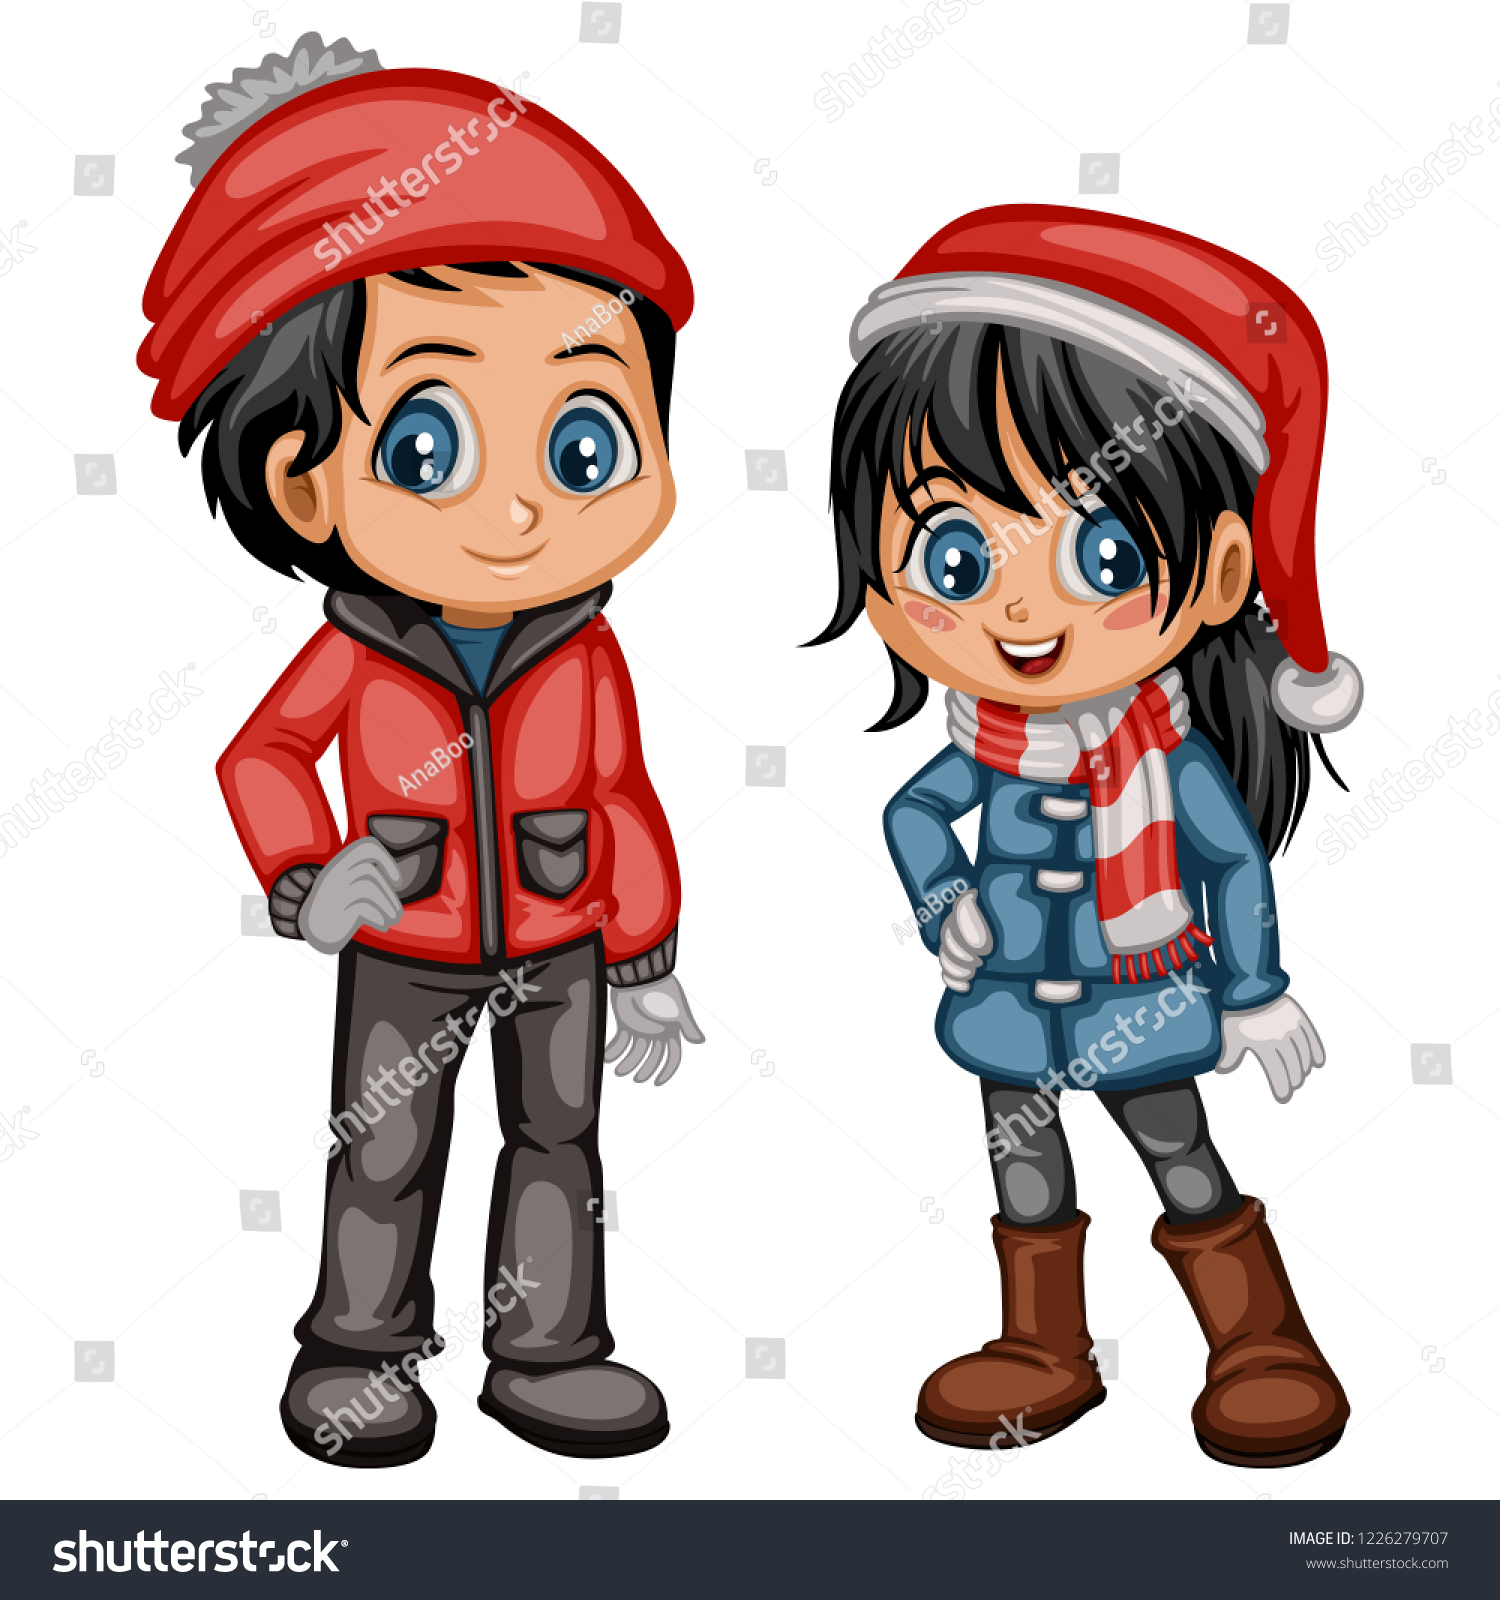 5b4fcacb1 Cute Cartoon Boy Girl Winter Clothes Stock Vector (Royalty Free ...